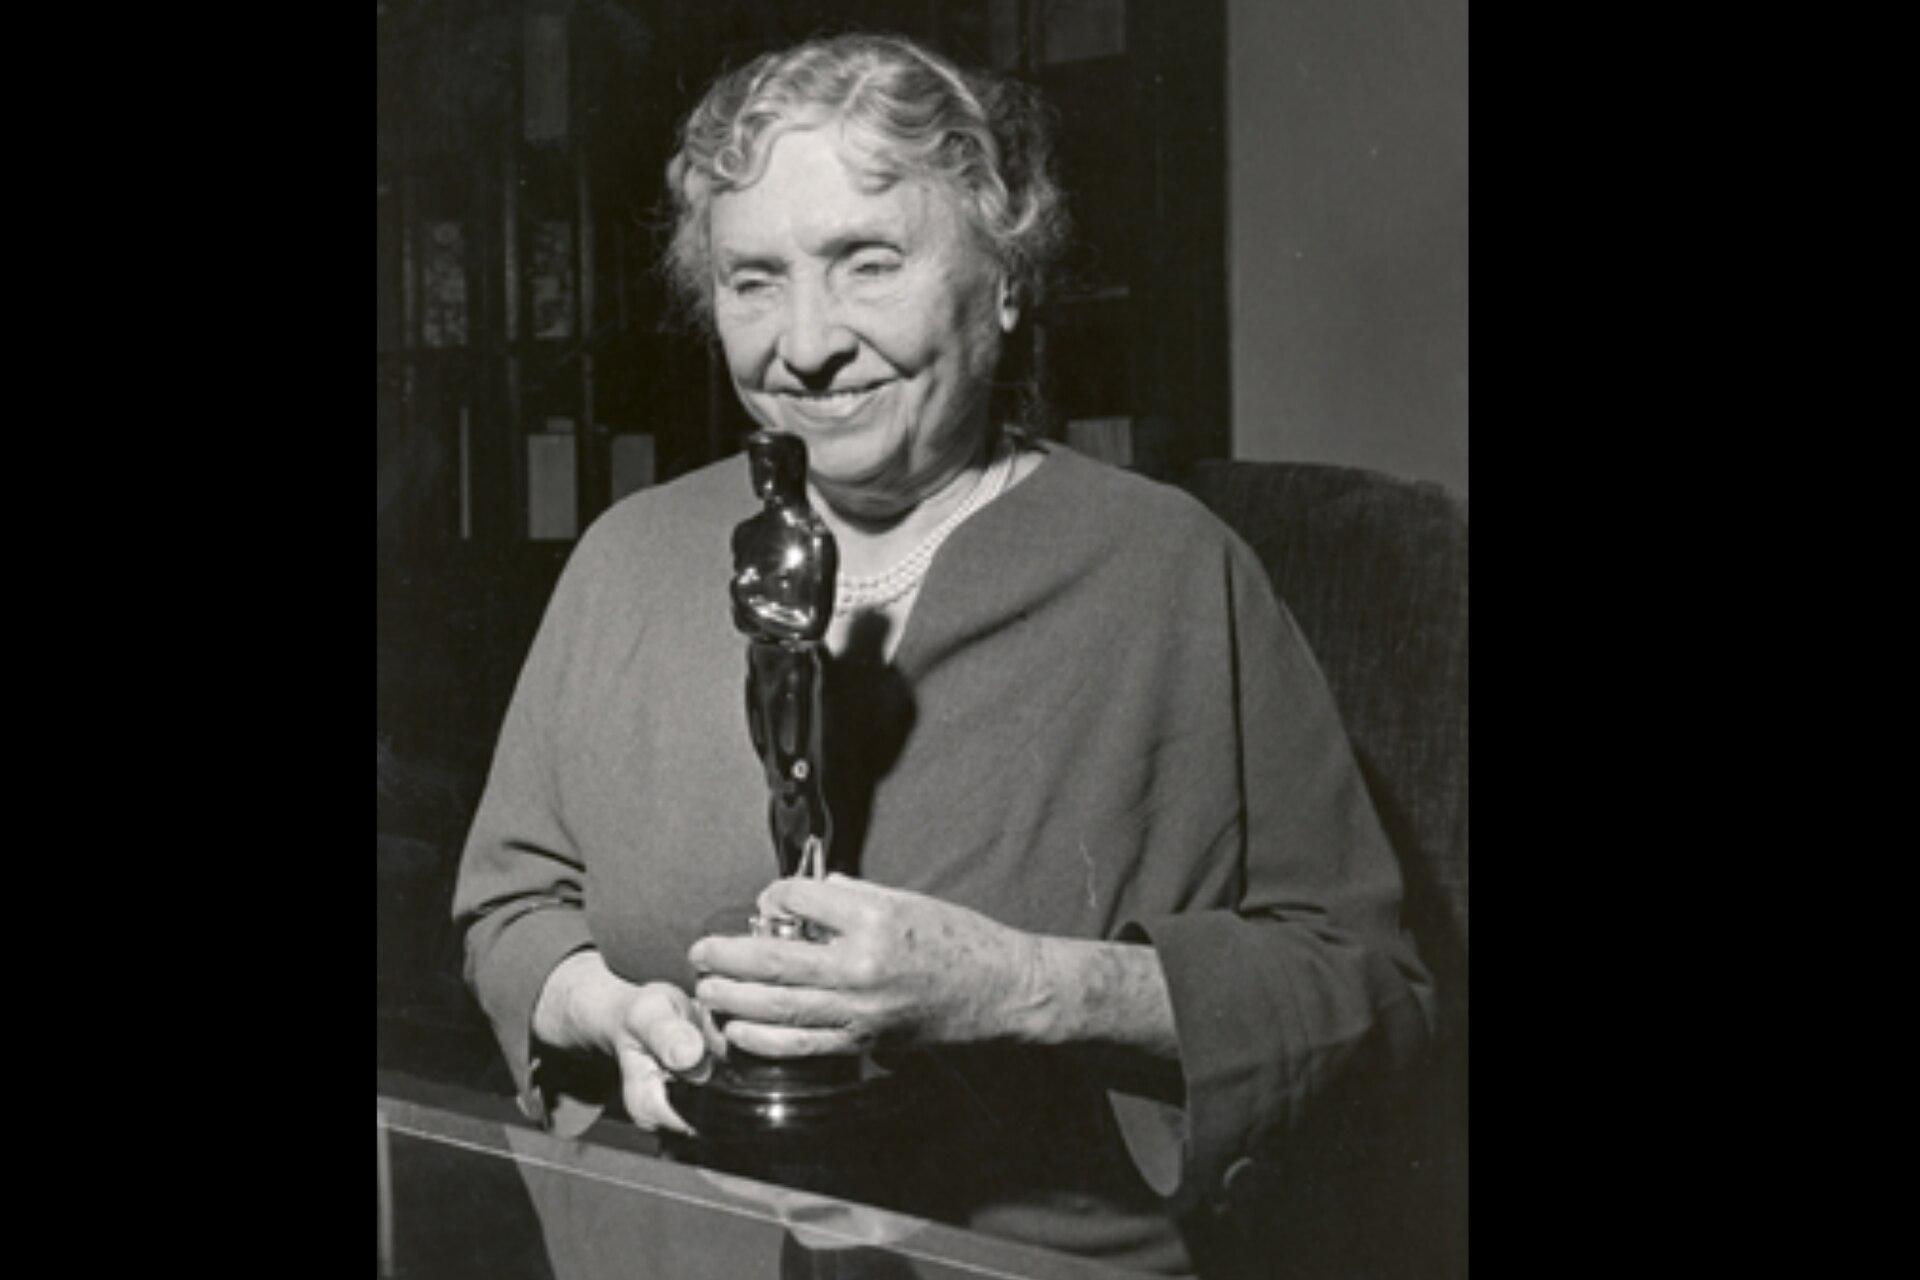 En 1955 le entregaron un premio Oscar honorífico